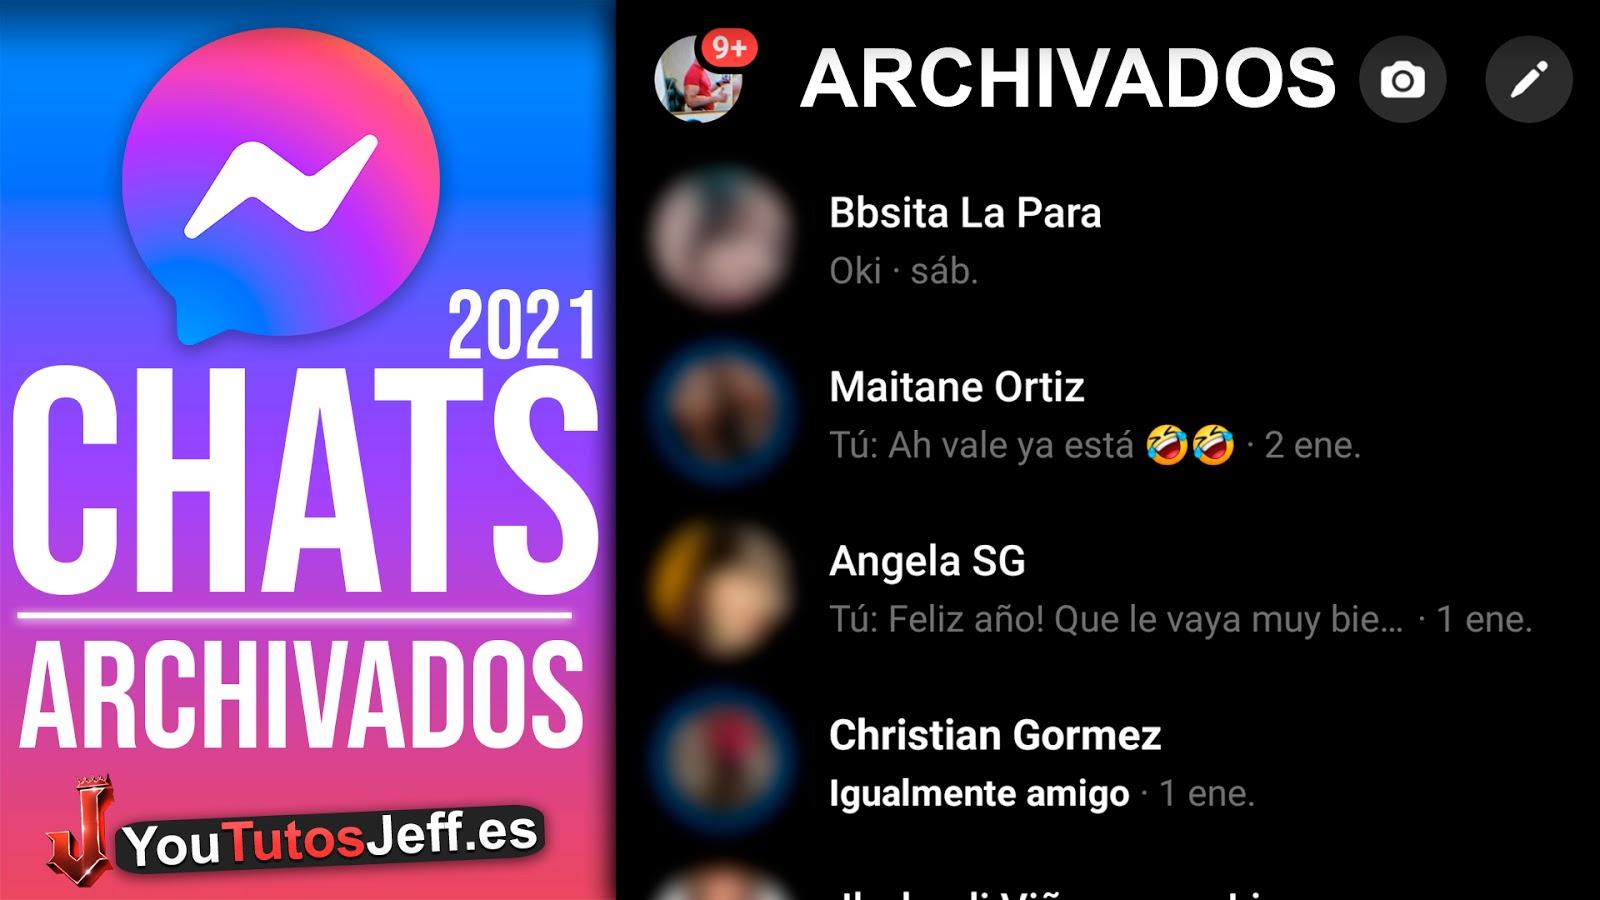 Archivar y Ver Mensajes Archivados Messenger Facebook 2021